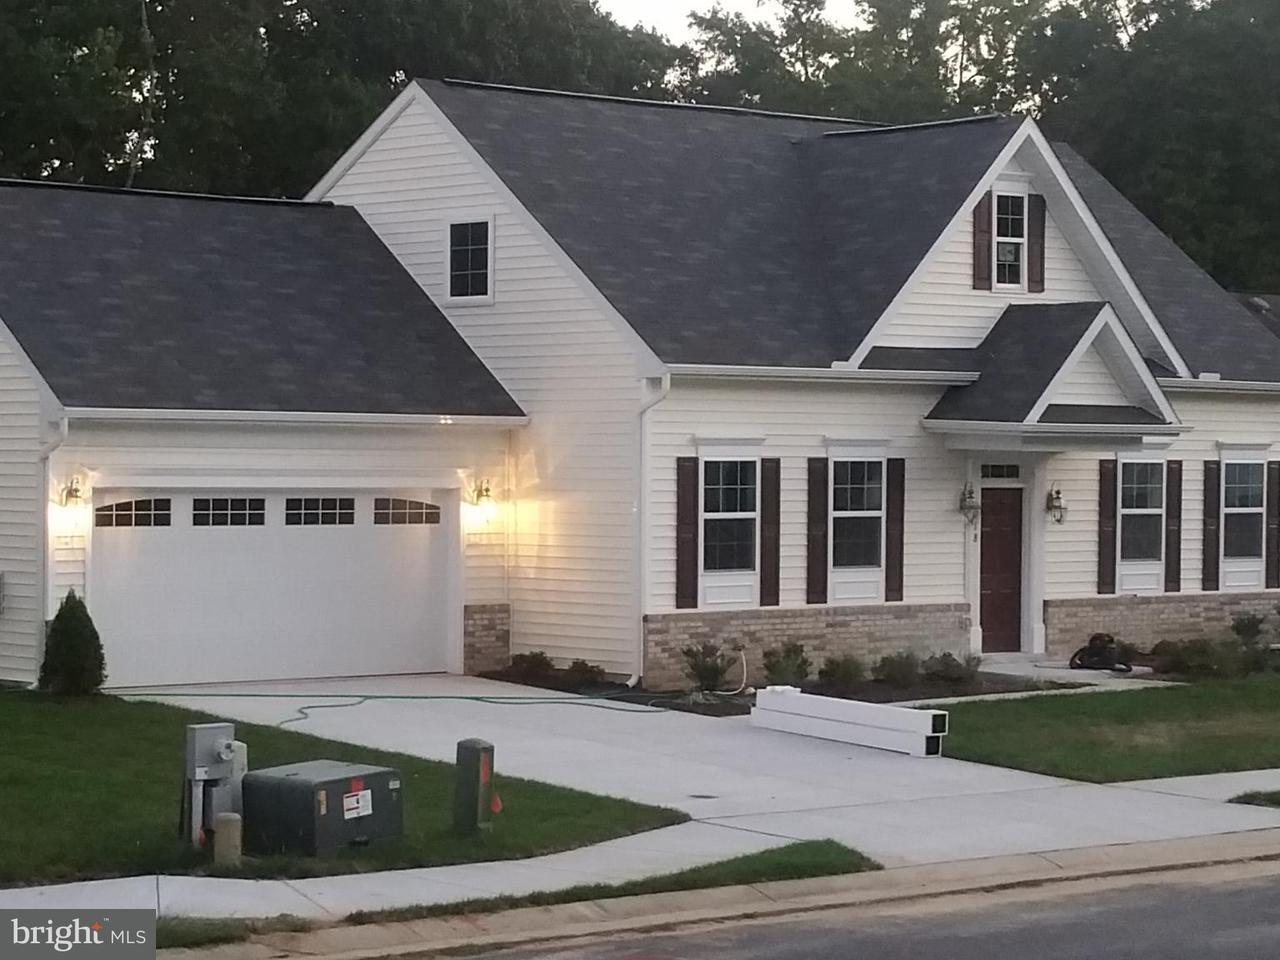 Single Family for Sale at 304 Sydney Denton, Maryland 21629 United States